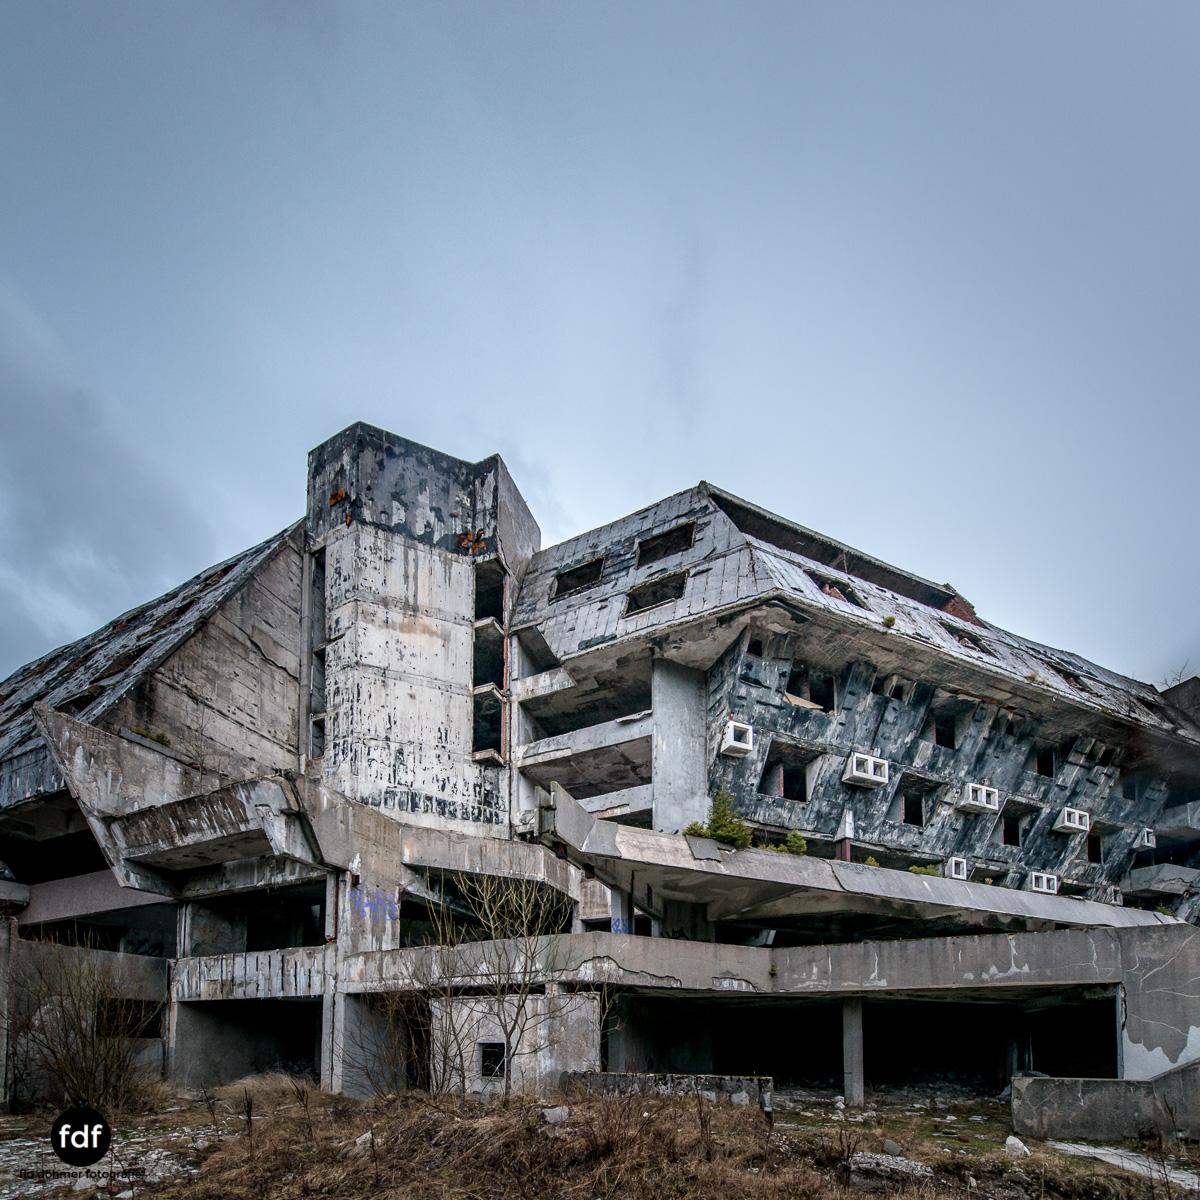 Hotel-Igman-Skijump-Skisprung-Sarajevo-Olympia84-Bosnien-Herzigowina-Lost-Place-5.JPG